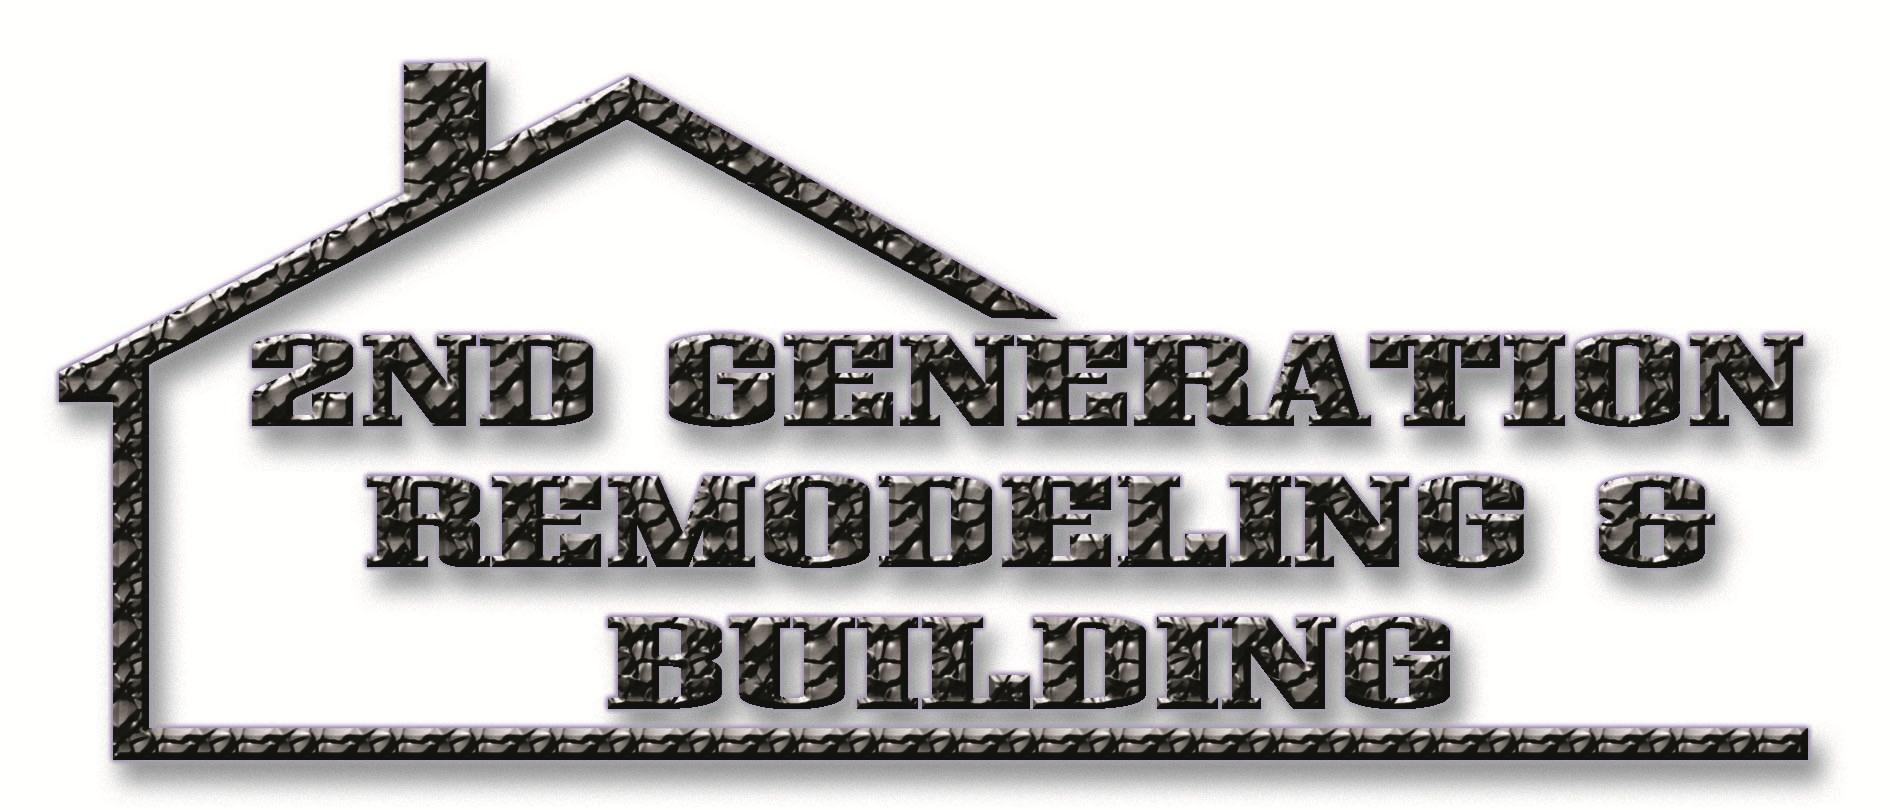 2nd Generation Remodeling logo